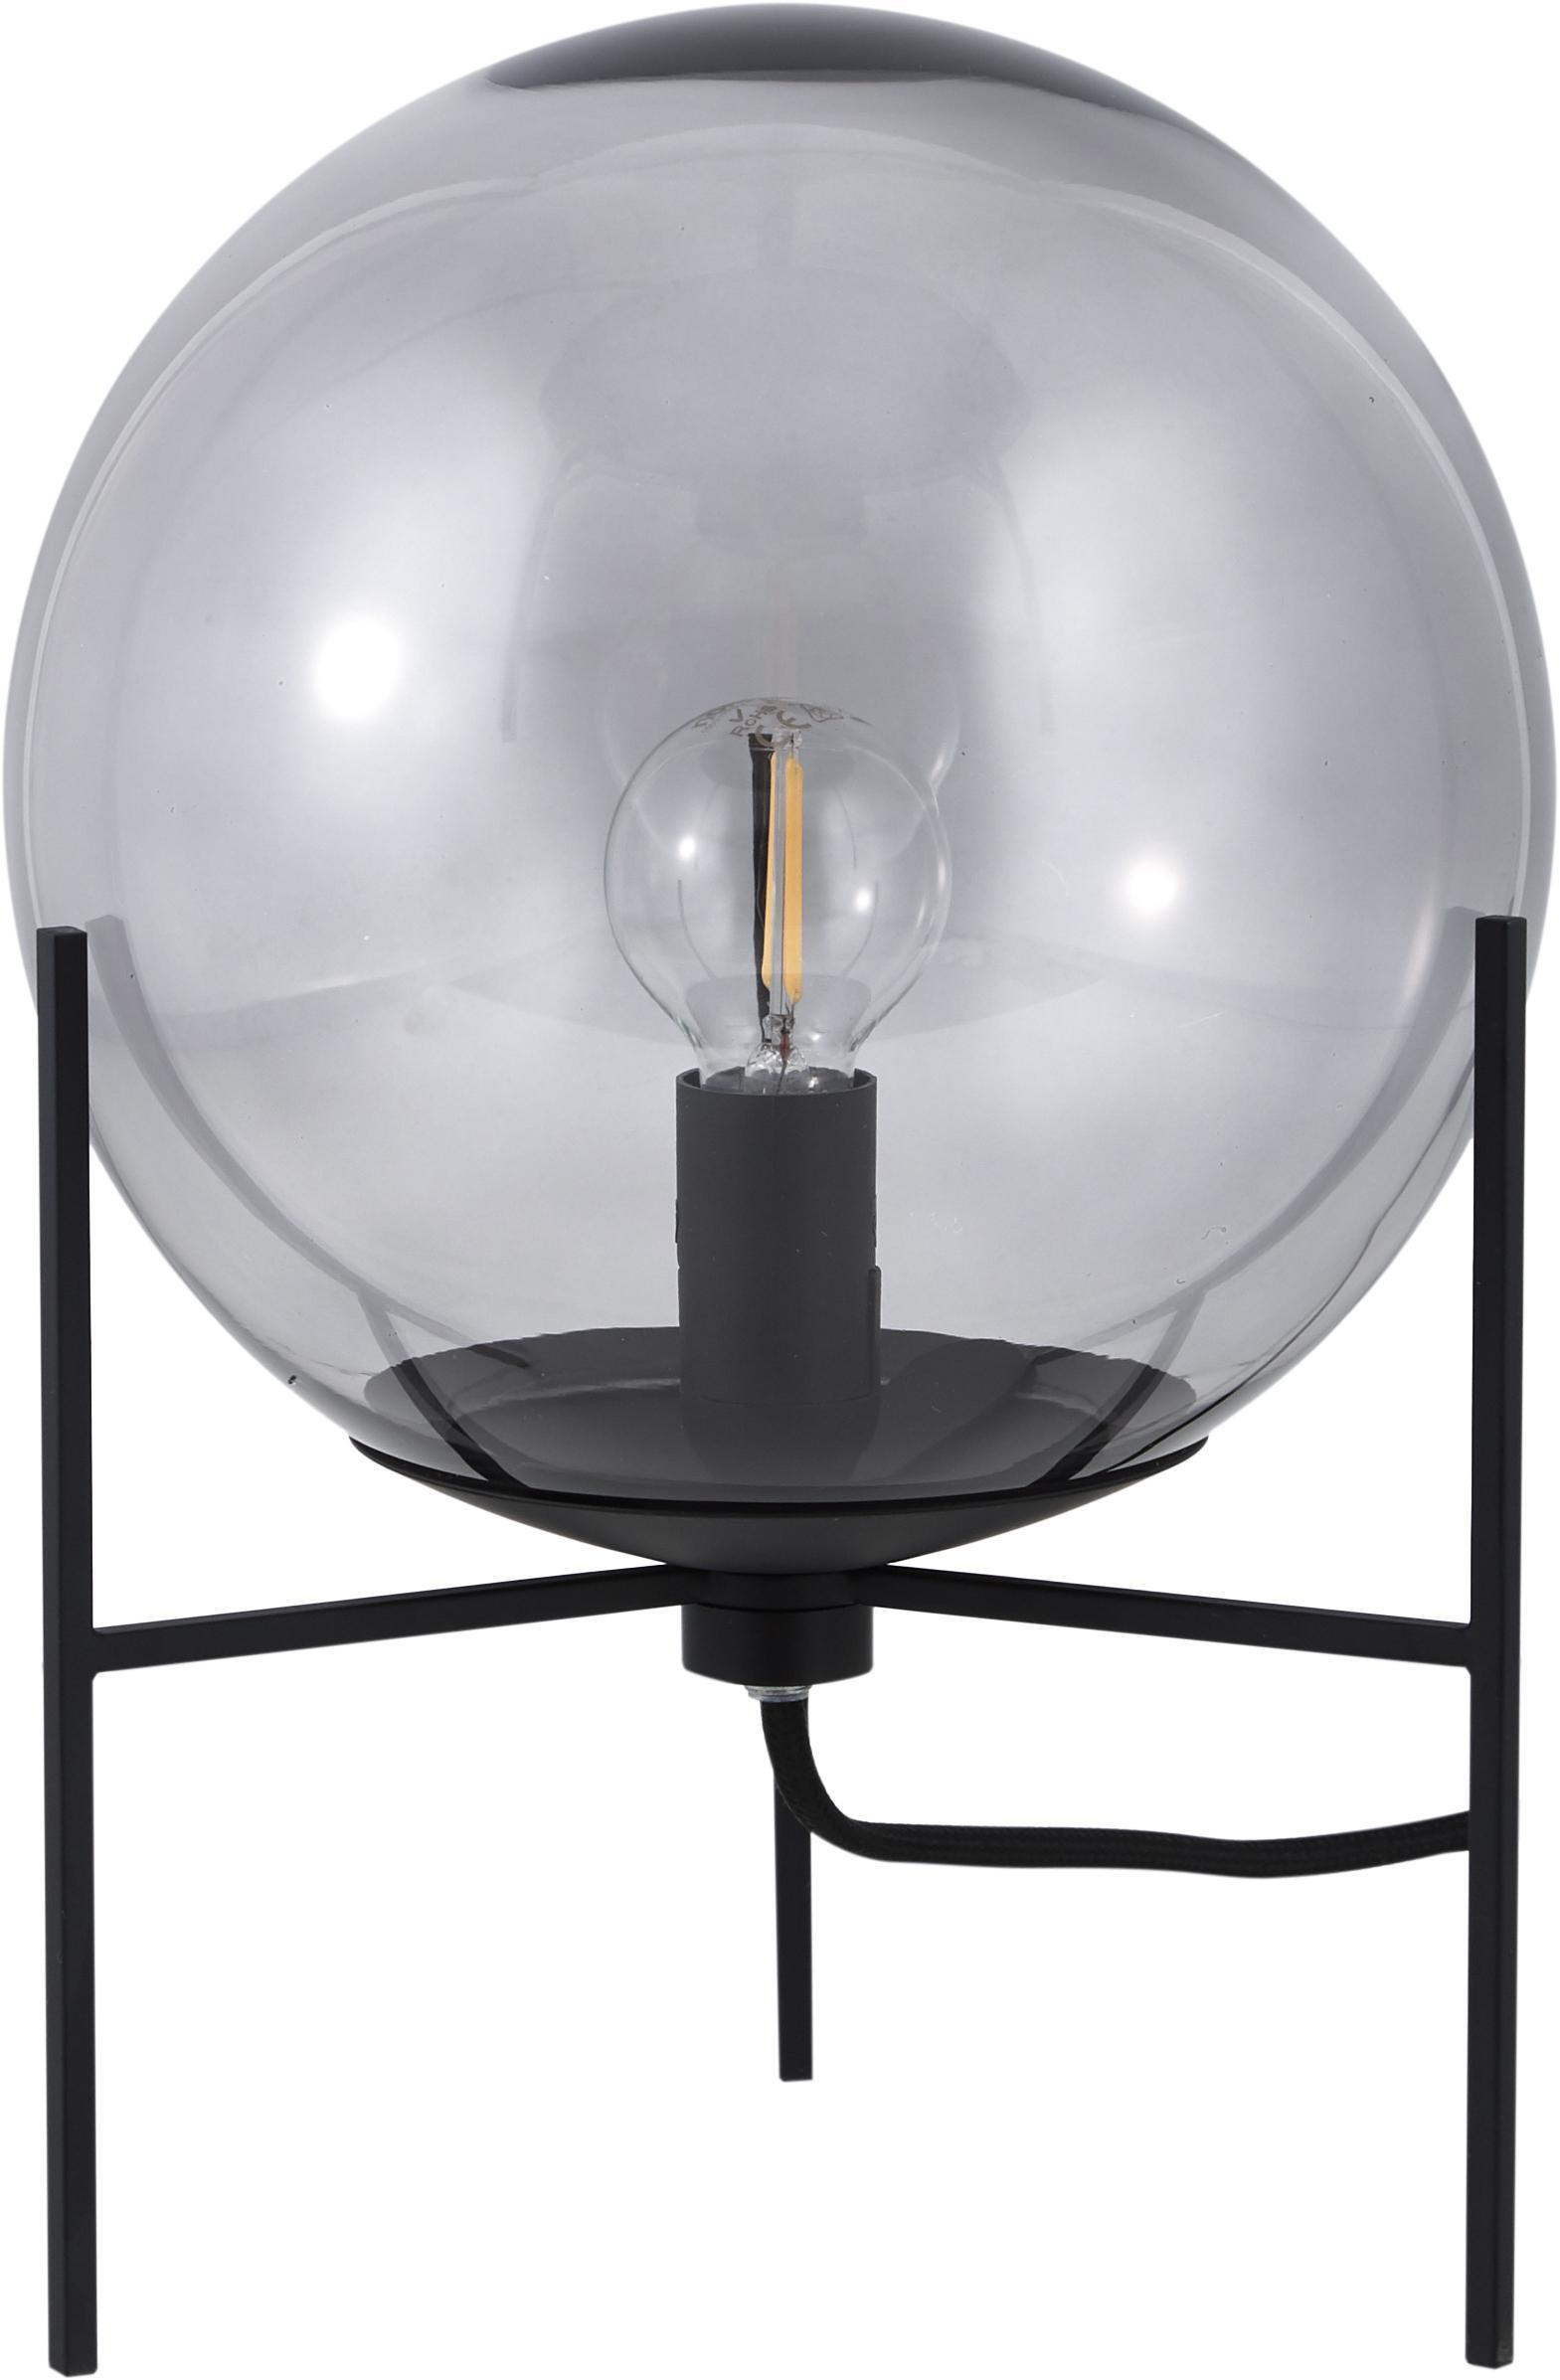 Tafellamp Alton van glas, Lampenkap: glas, Zwart, grijs, transparant, Ø 20 x H 29 cm